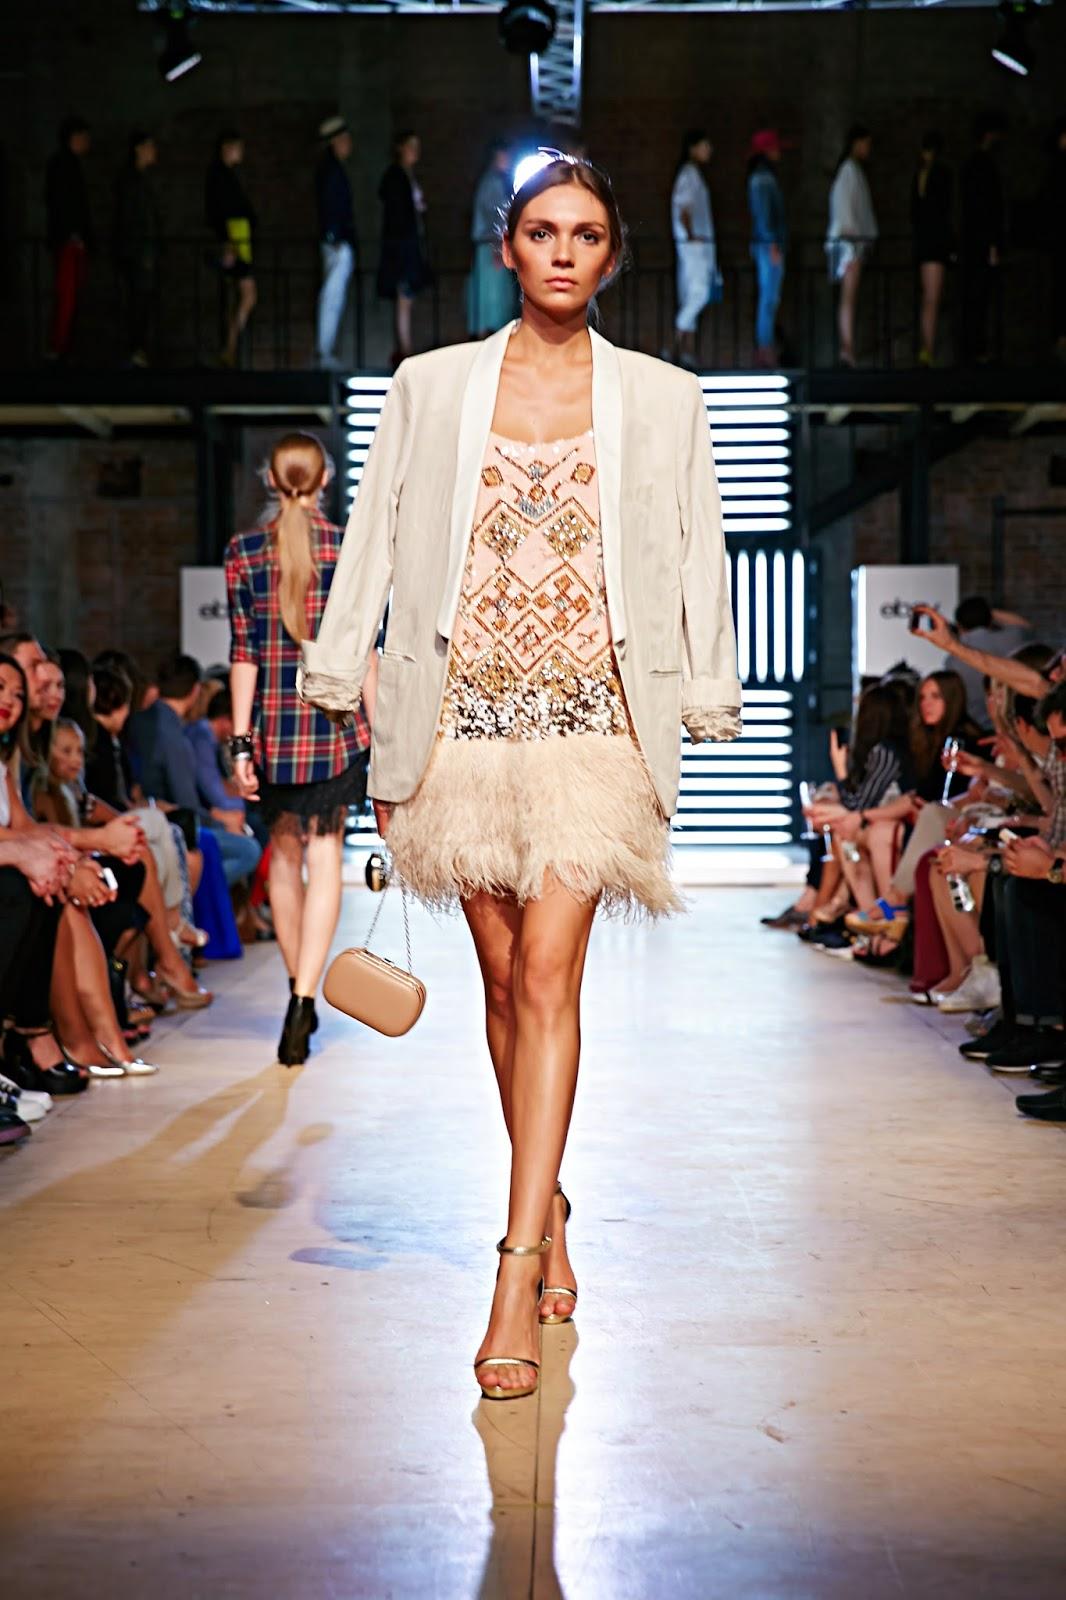 blog costa moda, blog moda, ebay collections, стилист Александр Рогов